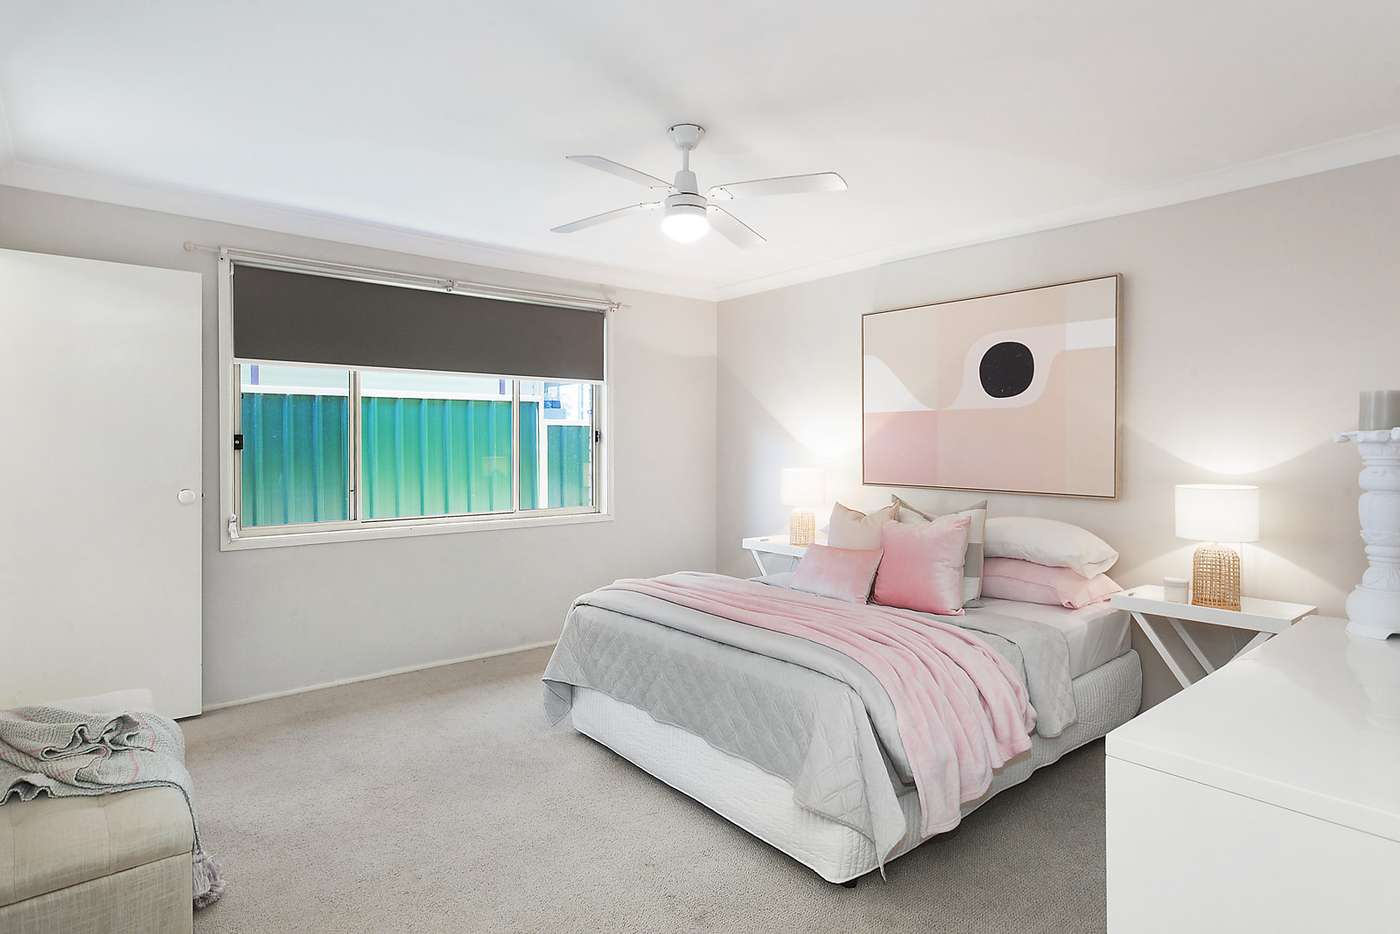 Fifth view of Homely house listing, 17 Ulana Avenue, Halekulani NSW 2262